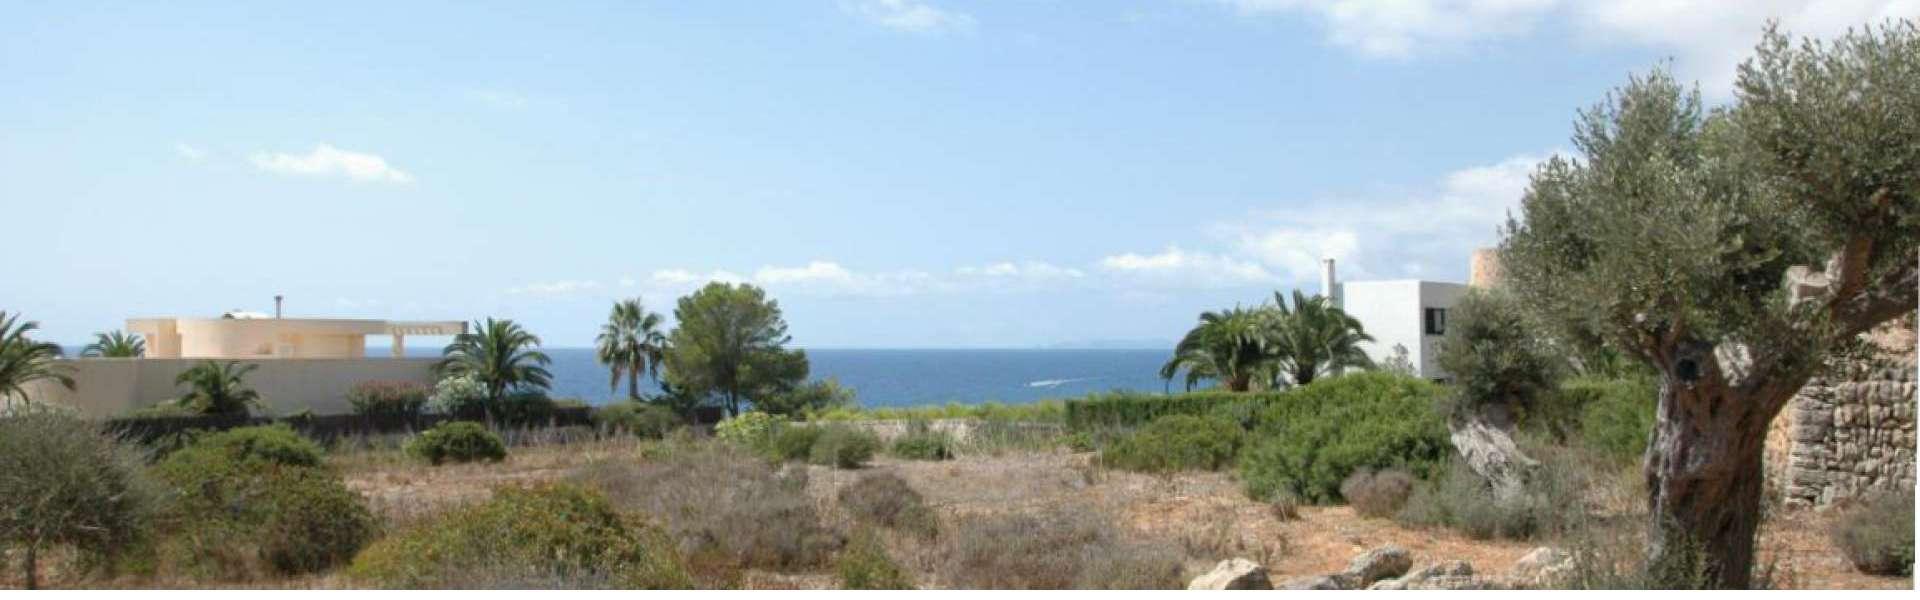 Meerblick-Grundstück in Top-Lage von Cala Santanyi